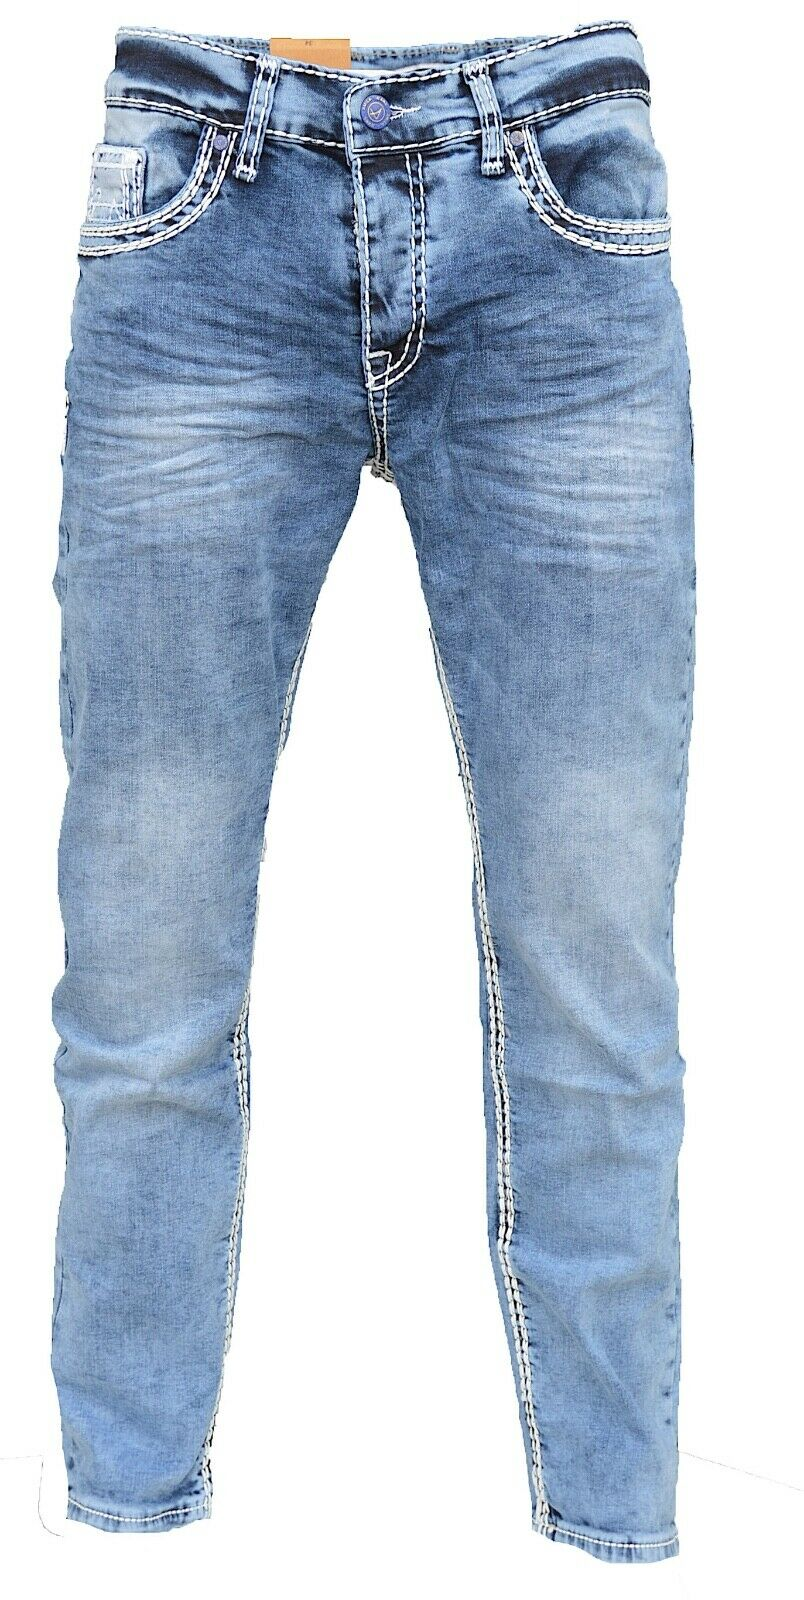 Herren-Jeans-Hose-Denim-KC-Black-Washed-Straight-Cut-Regular-Dicke-Naht-naehte Indexbild 25